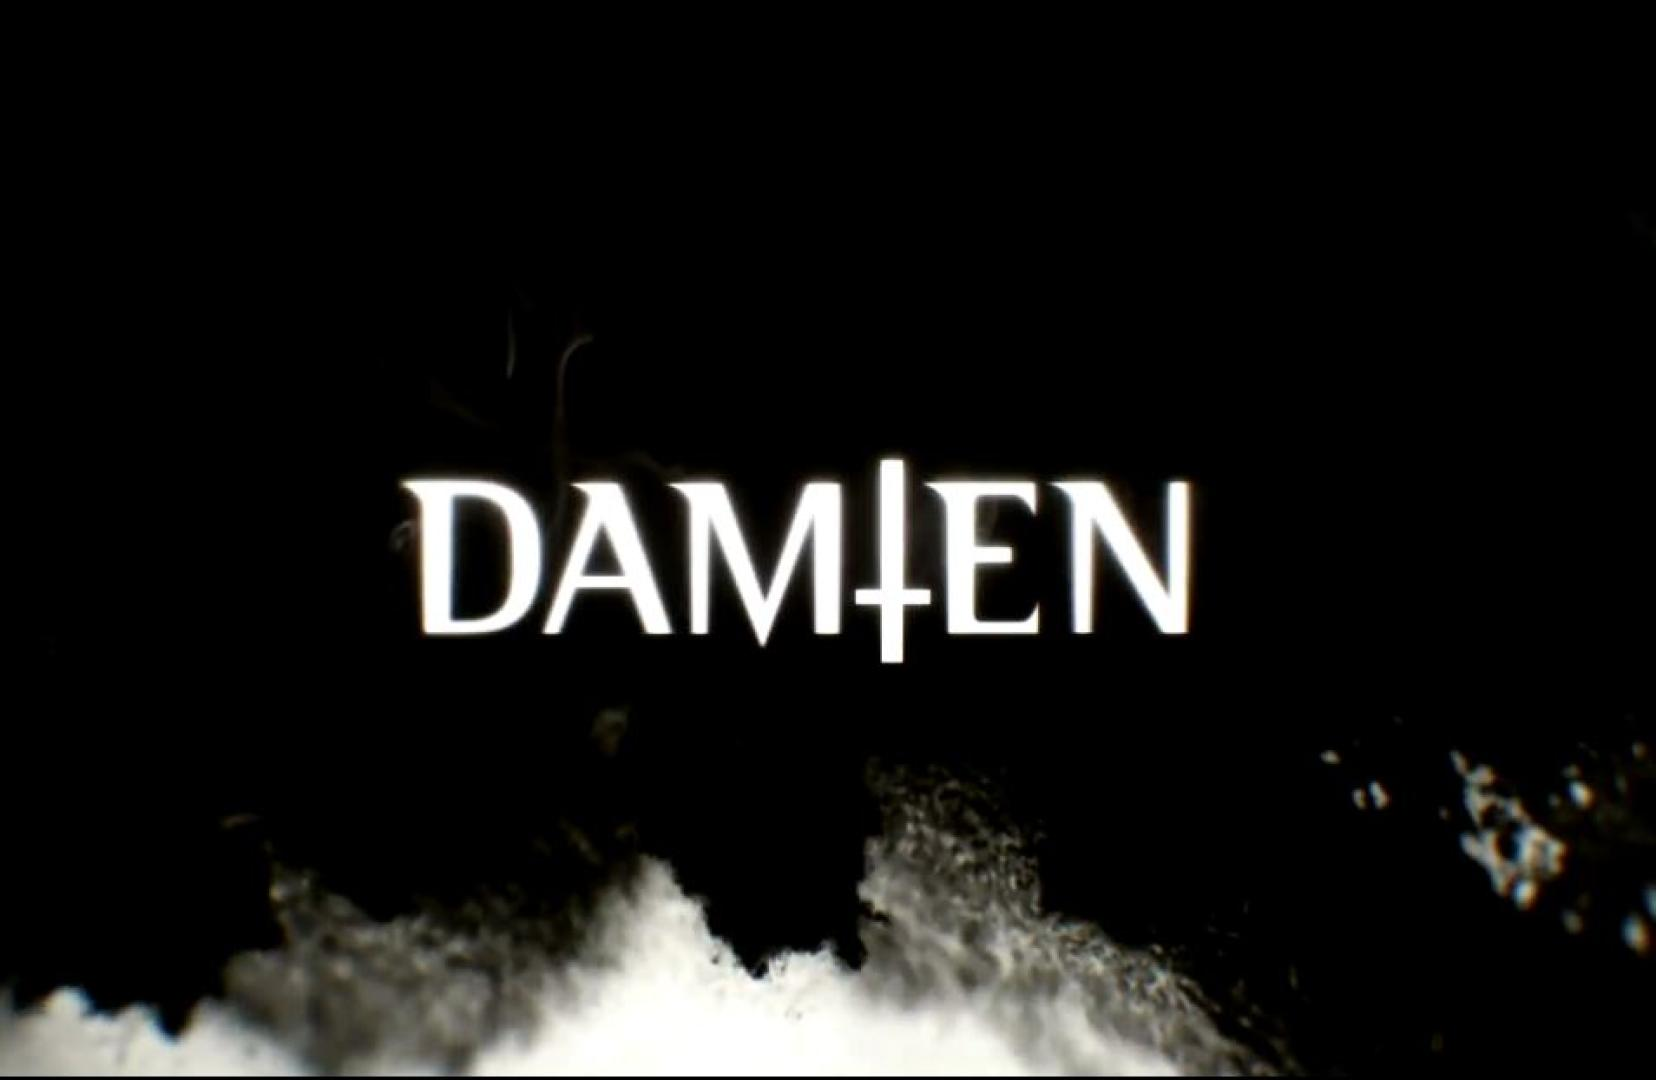 Damien 1x04